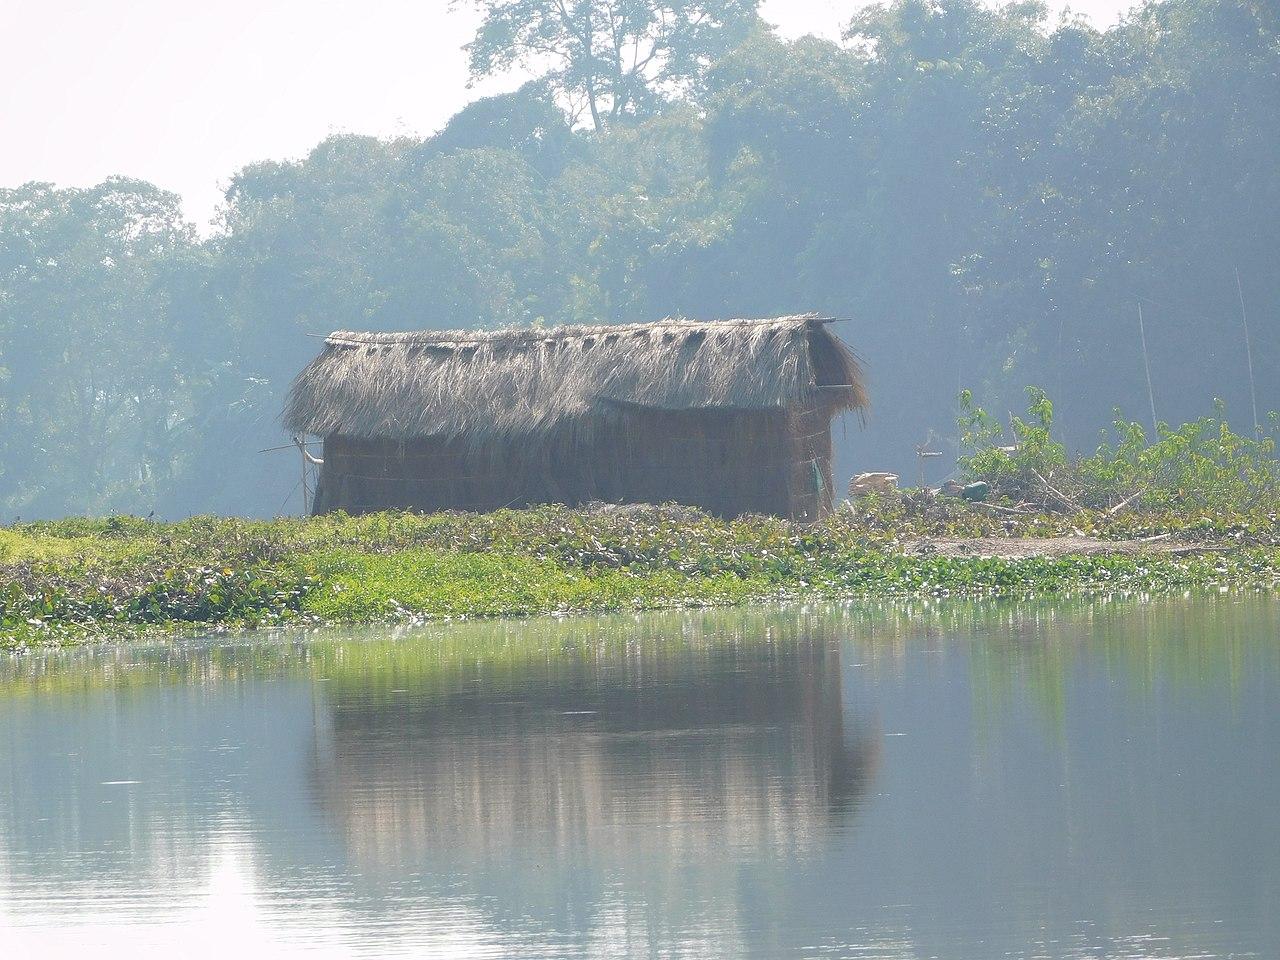 Majuli, a river island